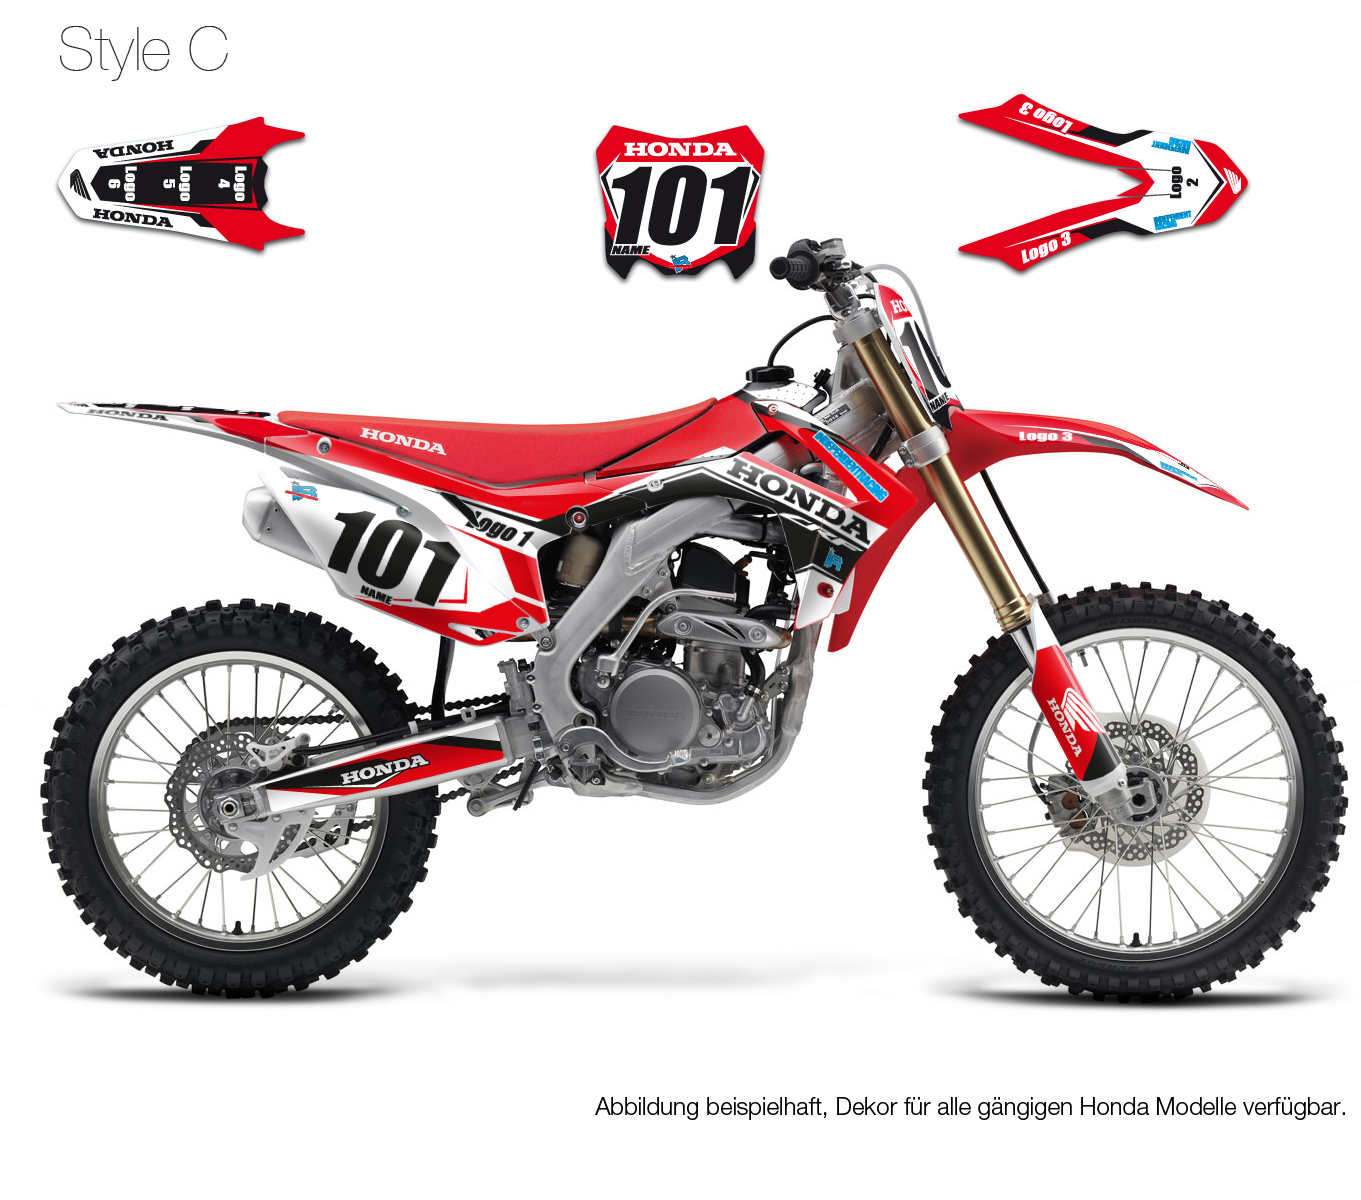 Motocross dekor honda stock1 for Dekor shop